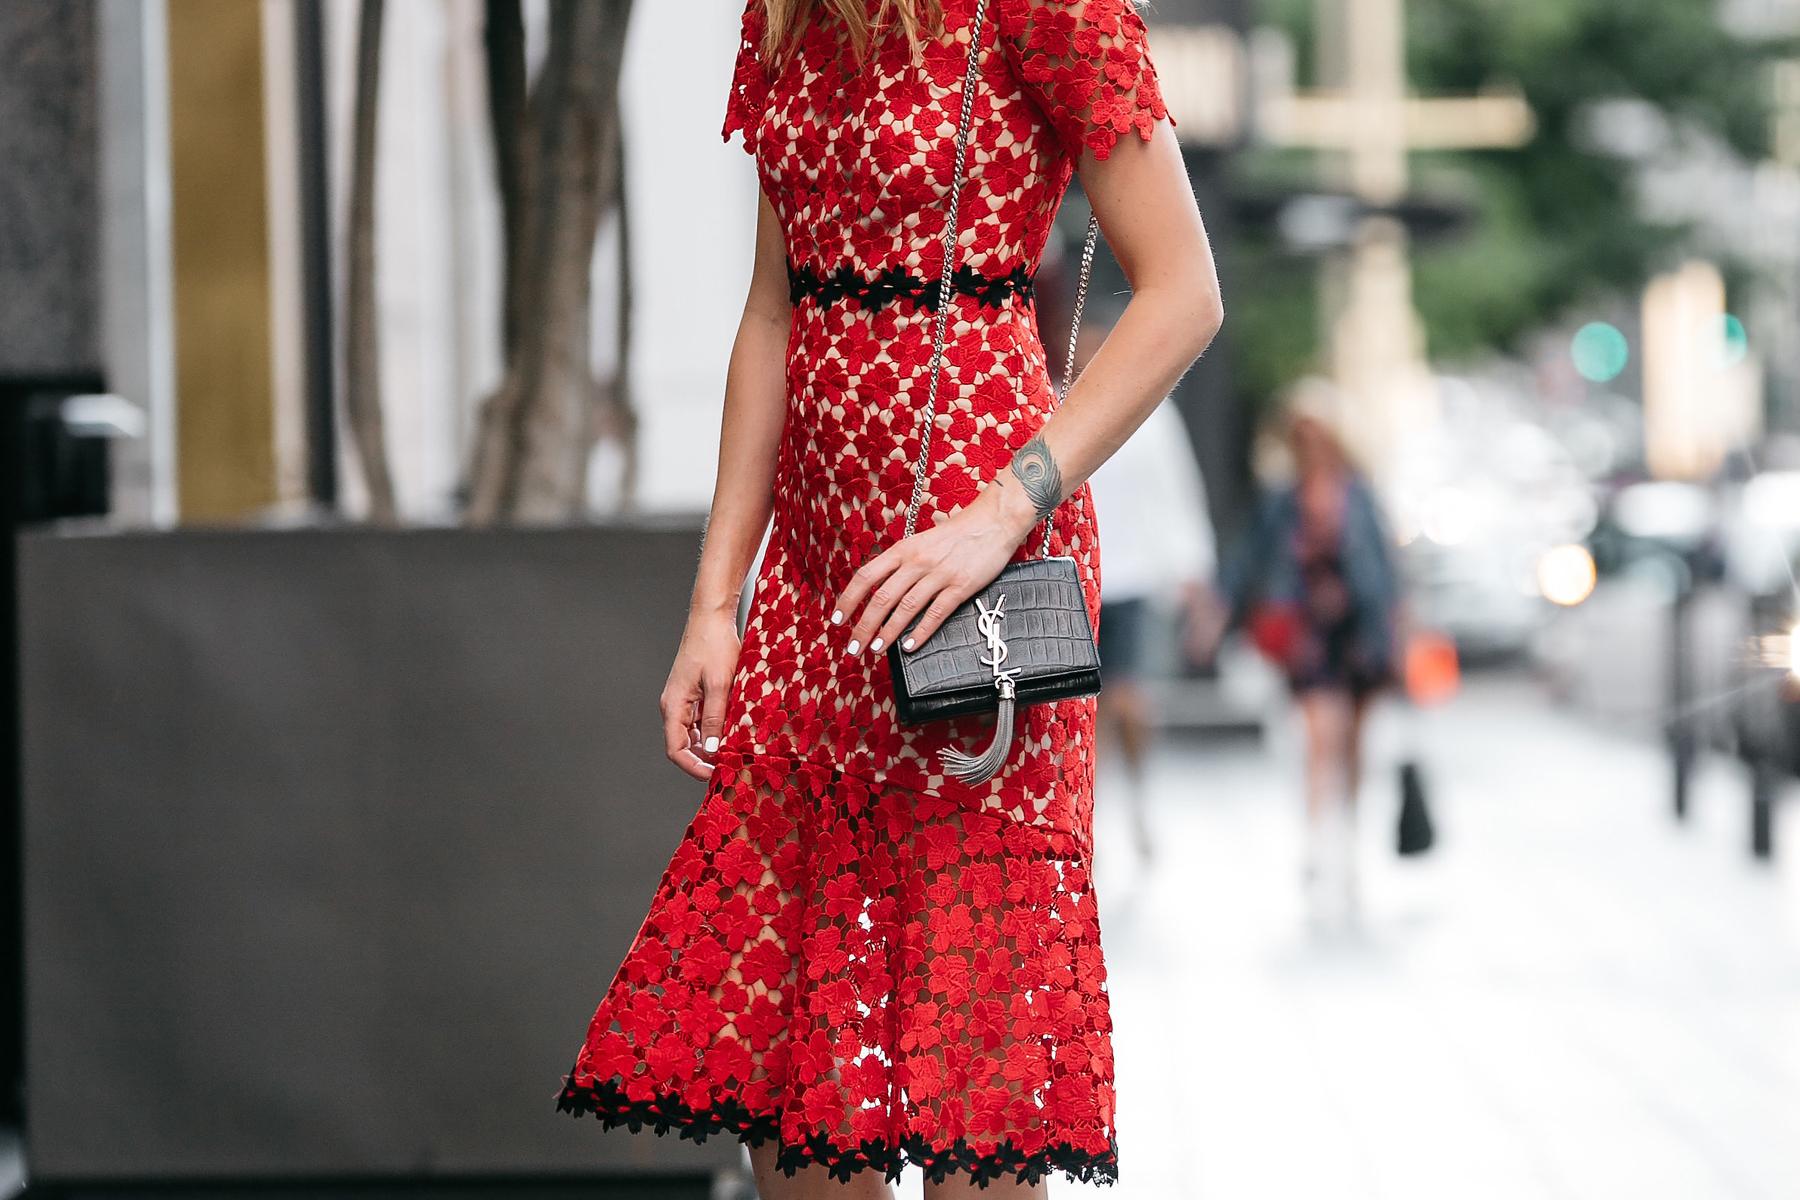 Fashion Jackson, Dallas Blogger, Fashion Blogger, Street Style, Jill Stuart Floral Red Lace Dress, Saint Laurent Monogram Handbag